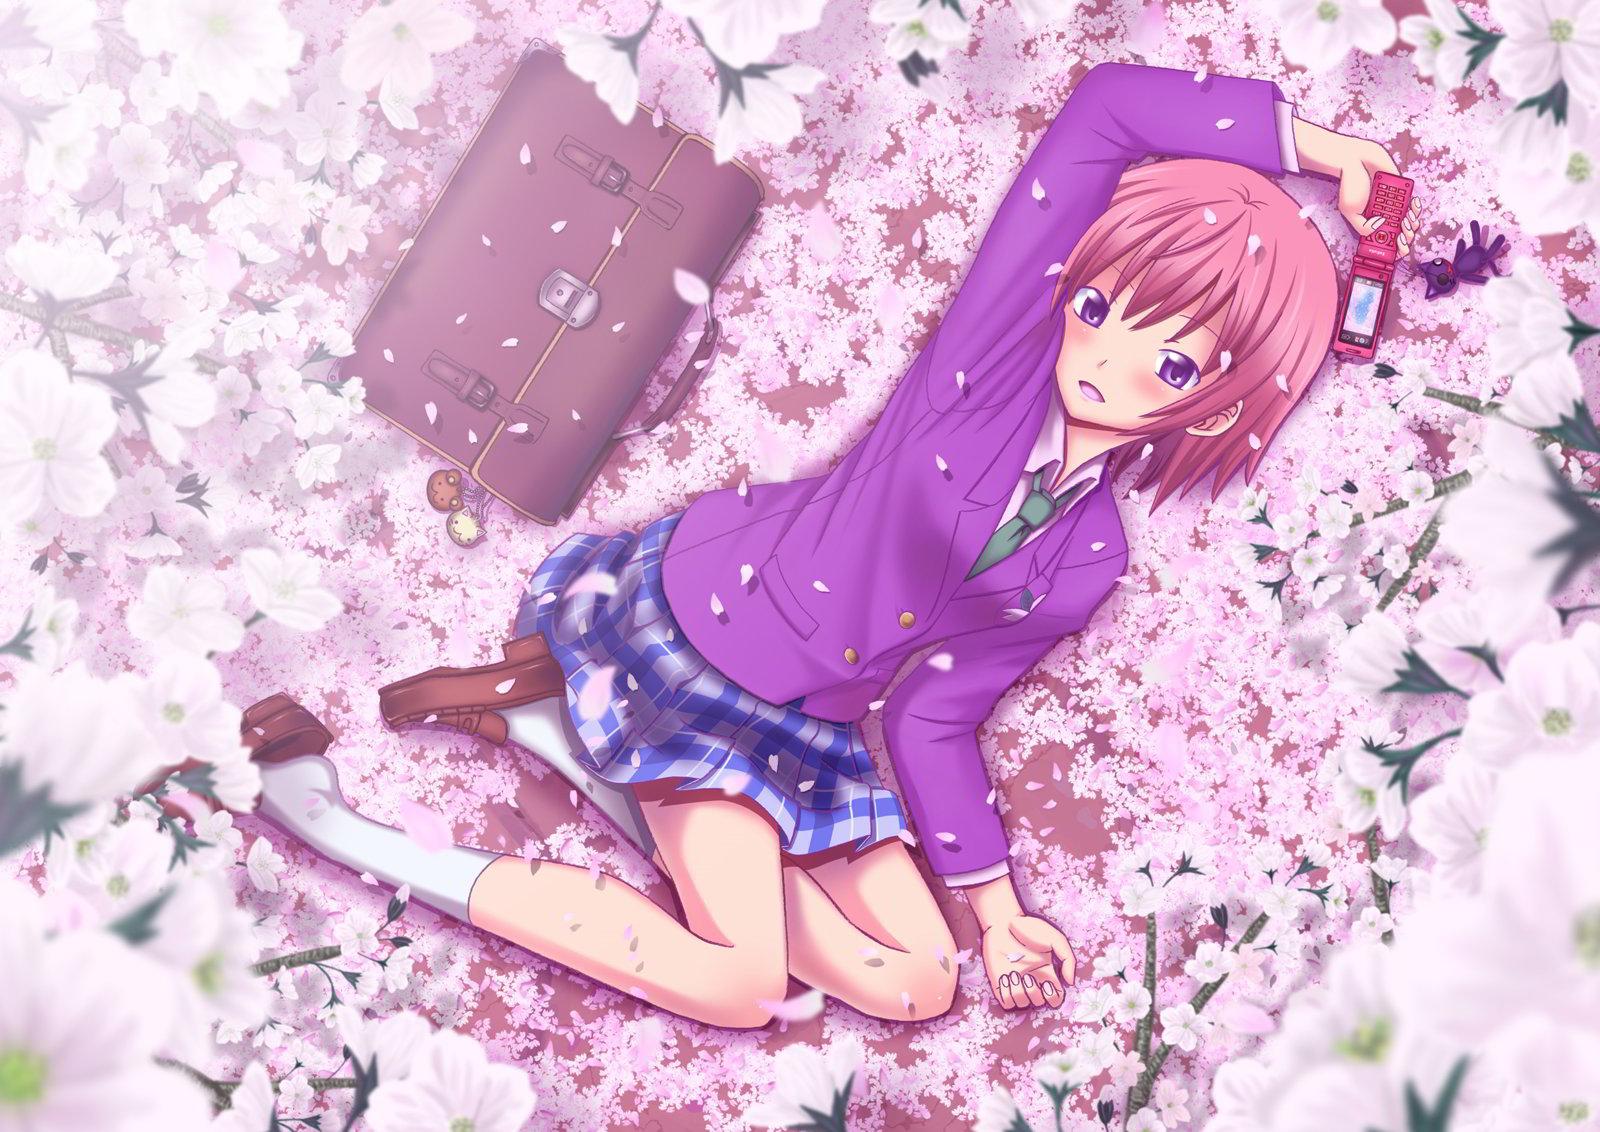 hinh nen anime girl dang yeu 4